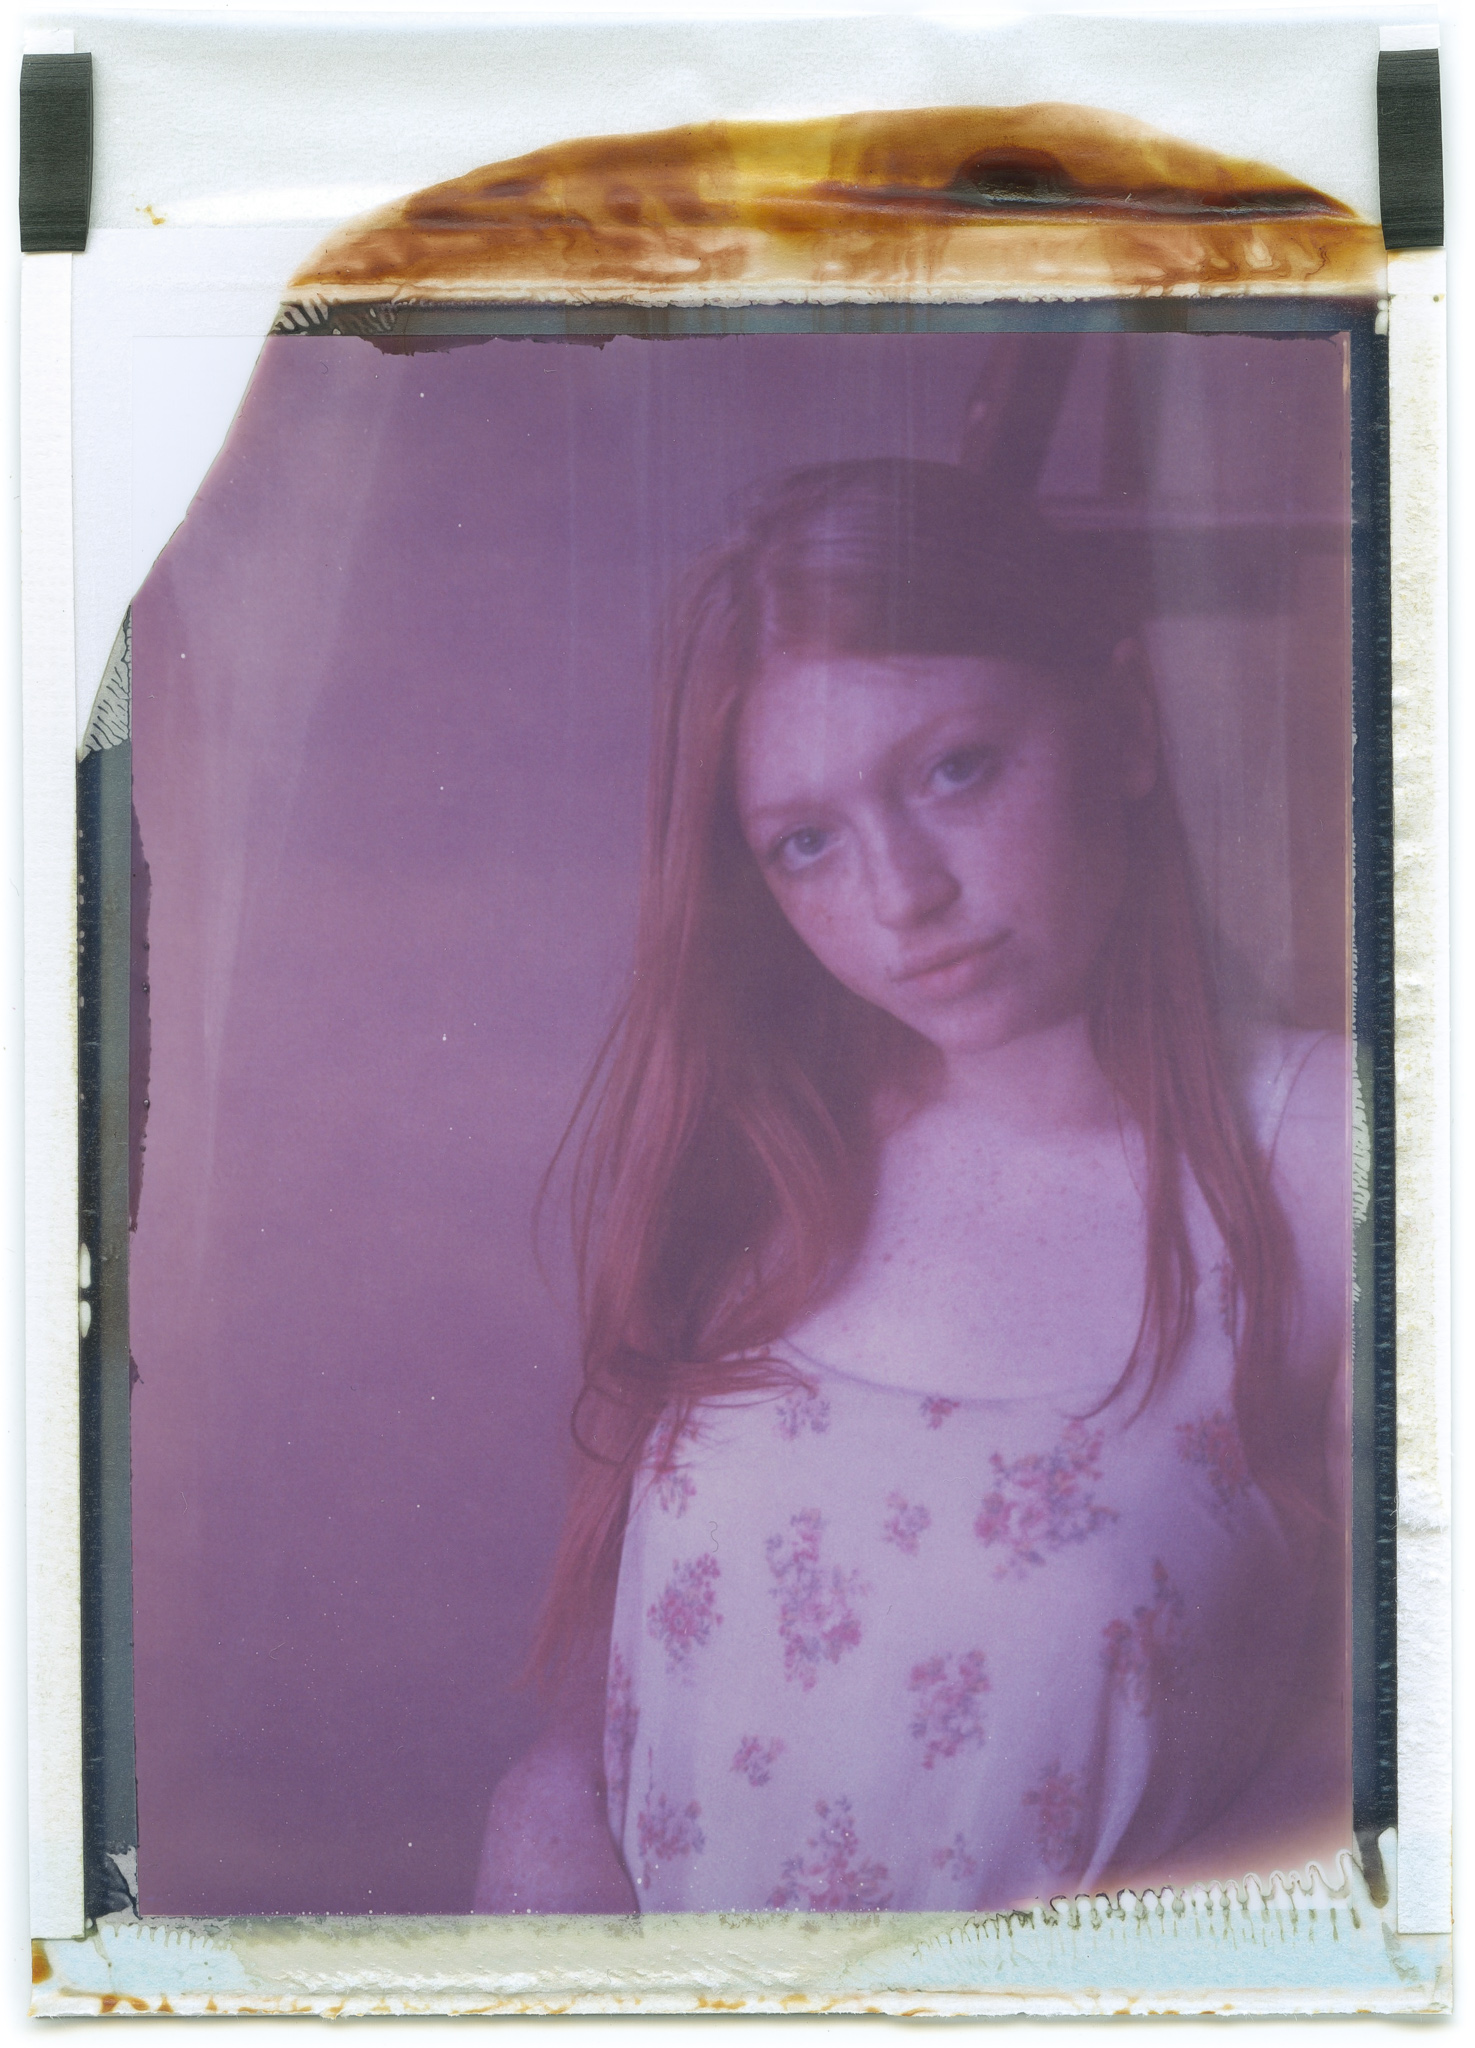 Lili Ruger POLAROID - 01.jpg